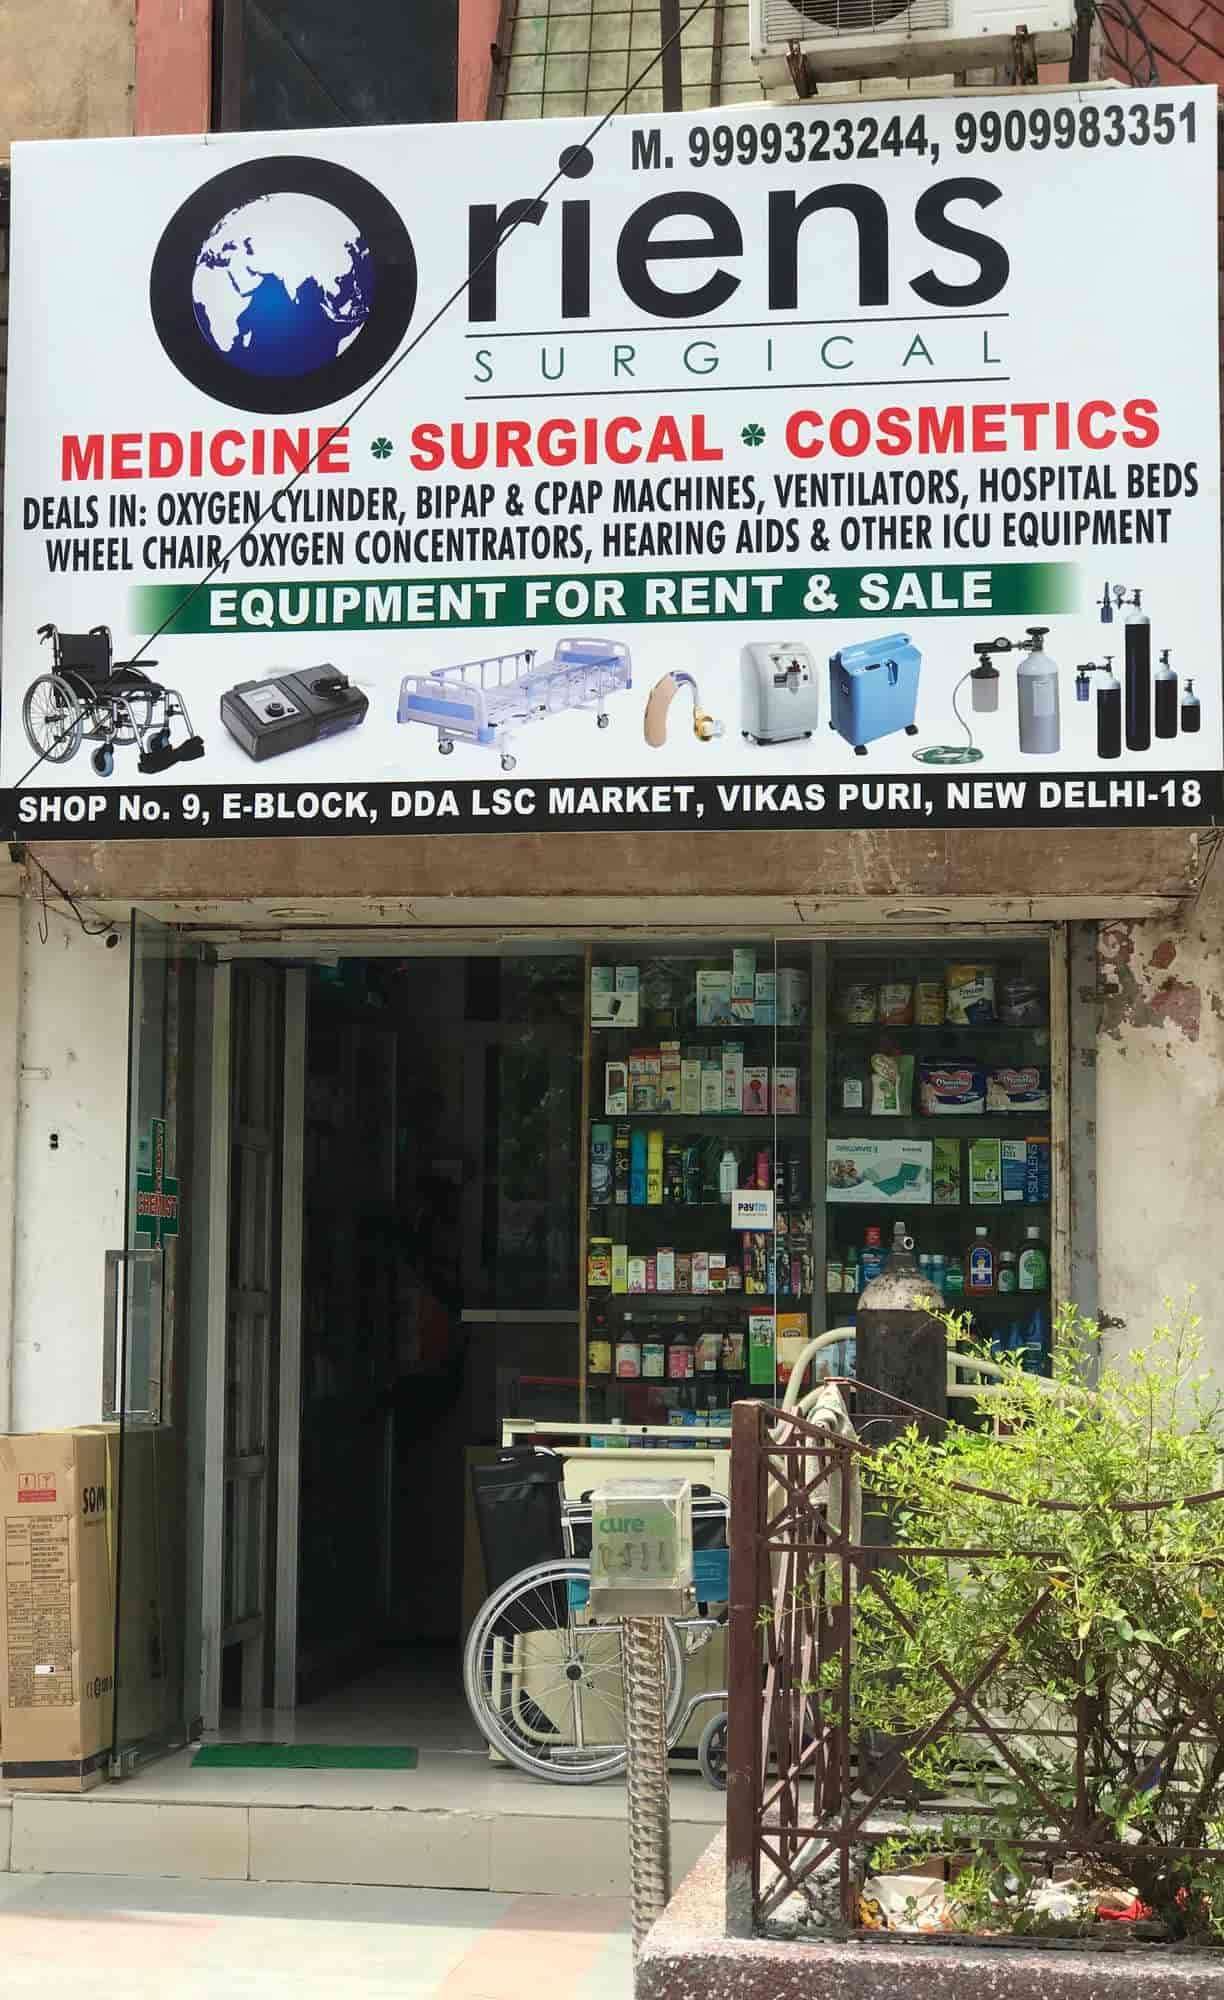 Oriens Surgical, Uttam Nagar - Oxygen Cylinders On Hire in